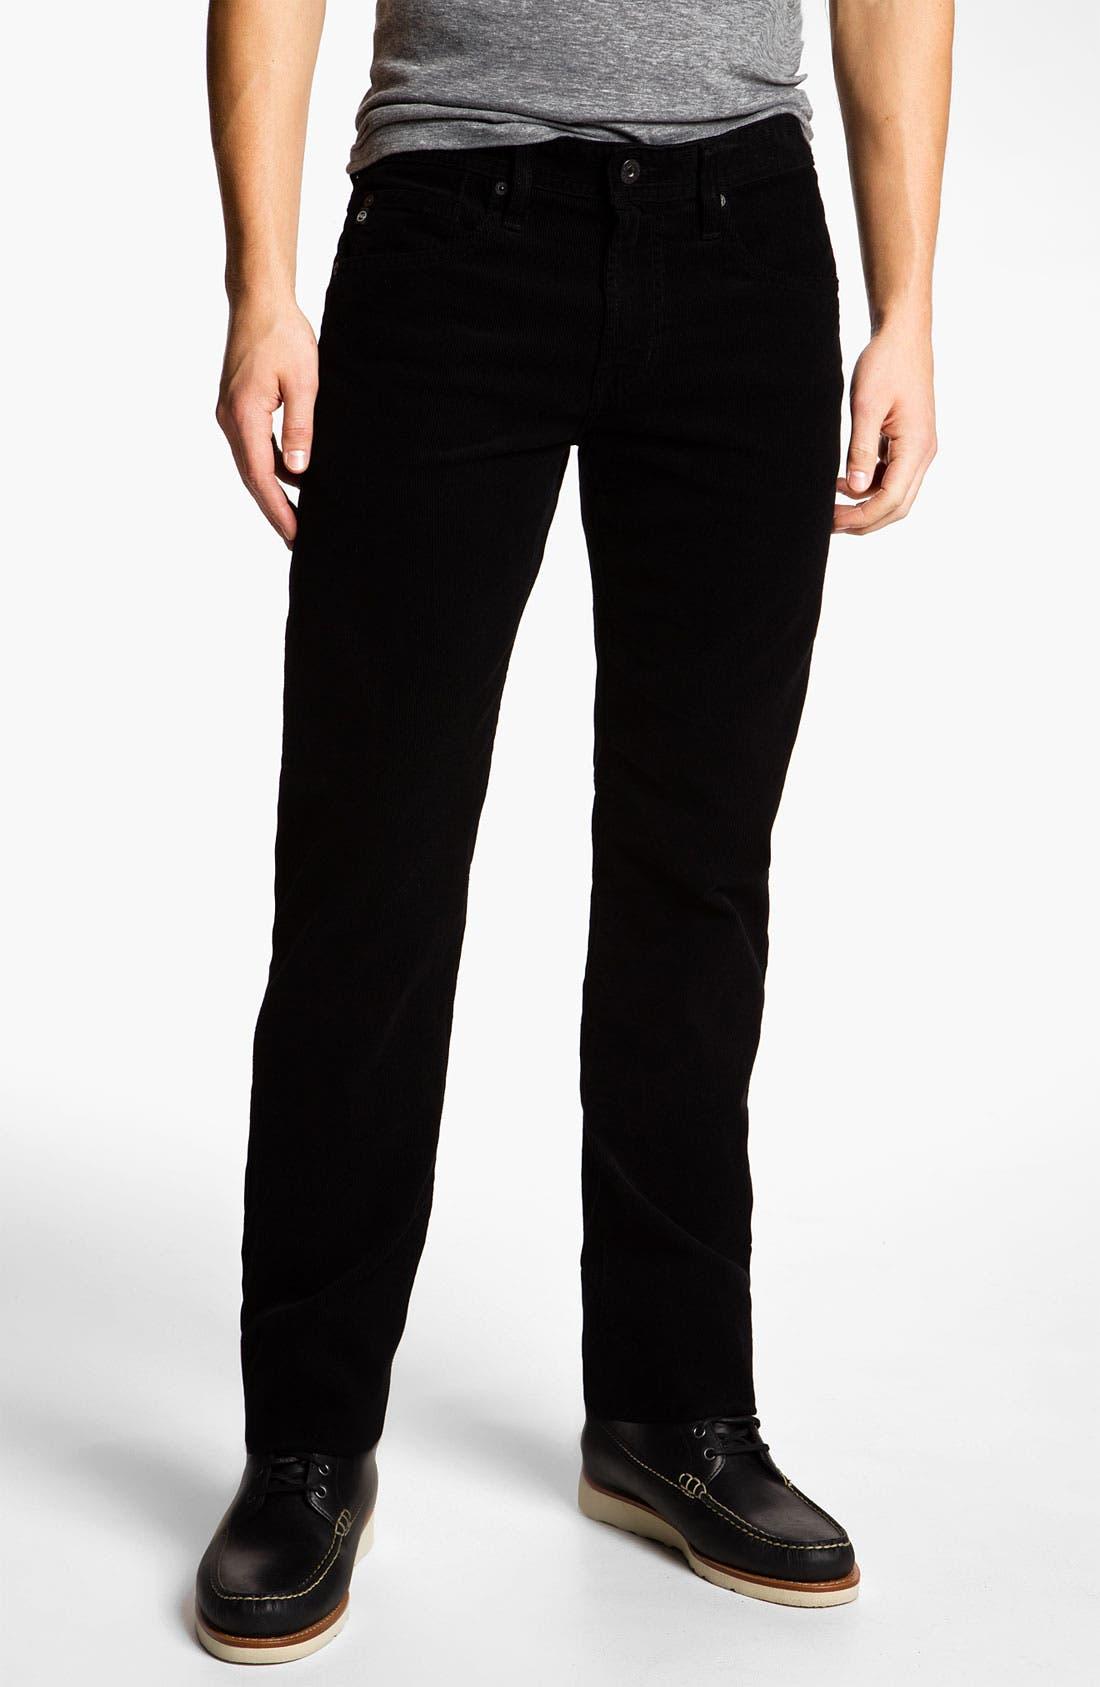 Jeans 'Matchbox' Slim Straight Leg Corduroy Pants,                             Main thumbnail 1, color,                             010